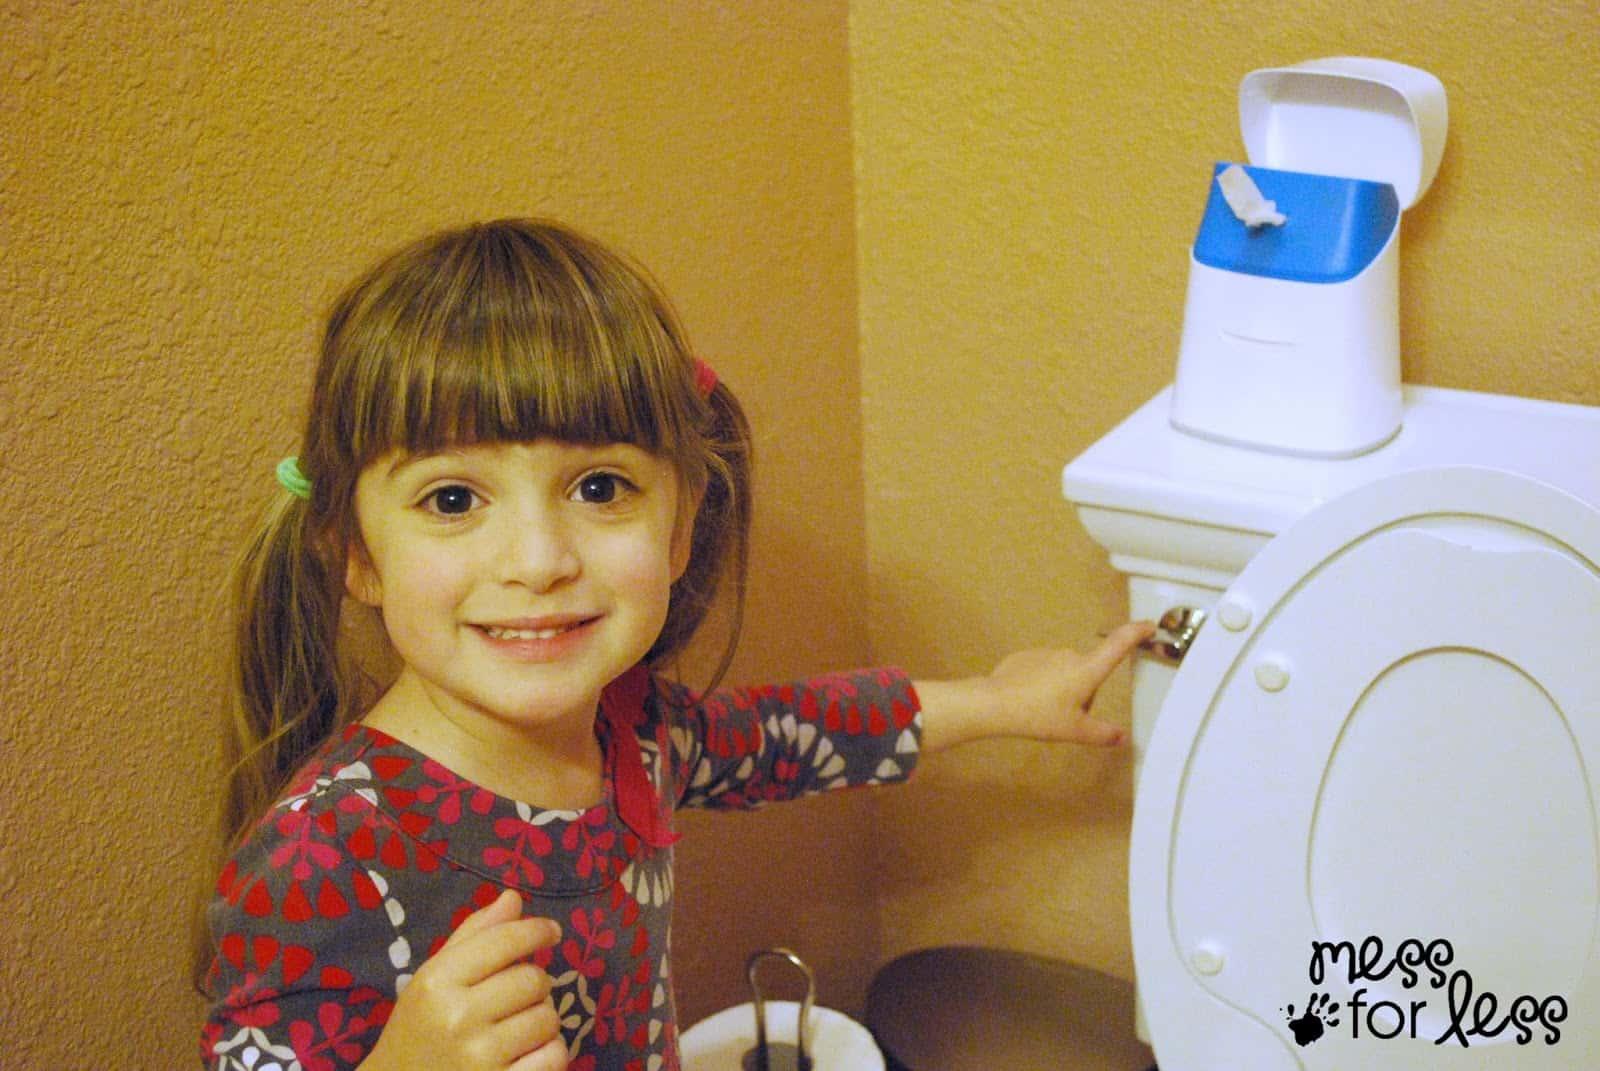 Using the potty #CtnlCareRoutine #PMedia #sponsored